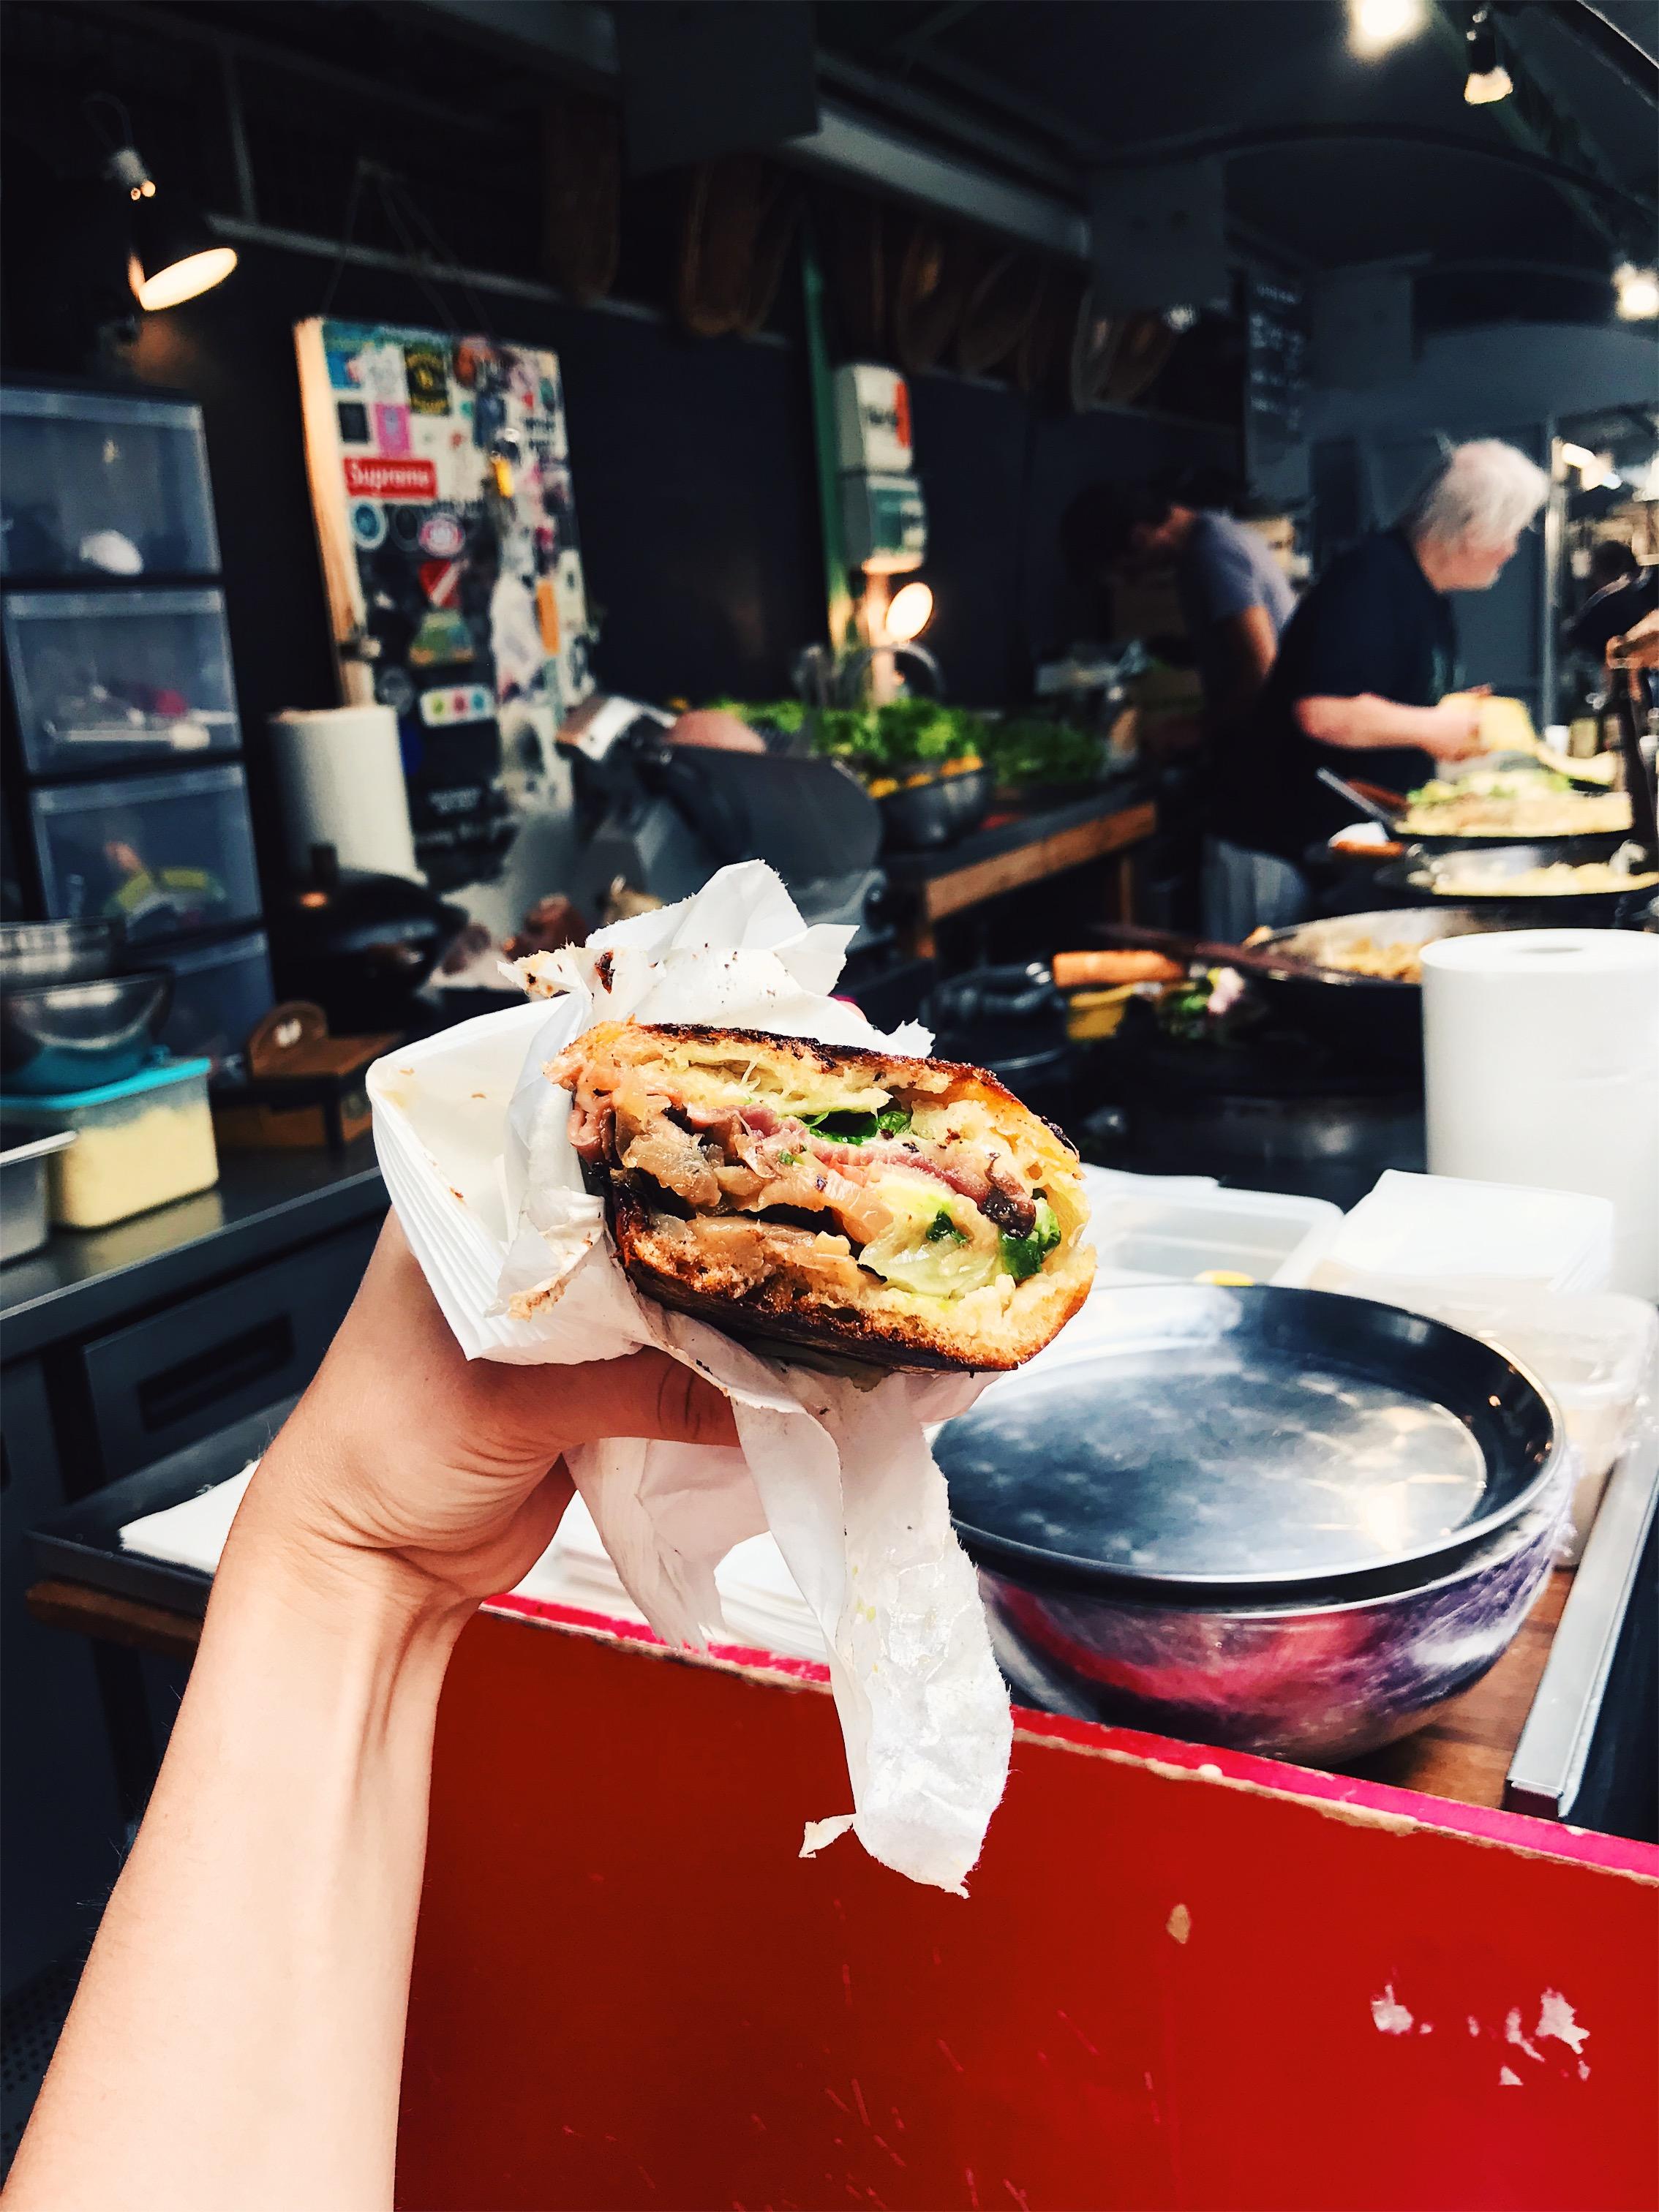 My half of the sandwich from Chez Alain Miam Miam